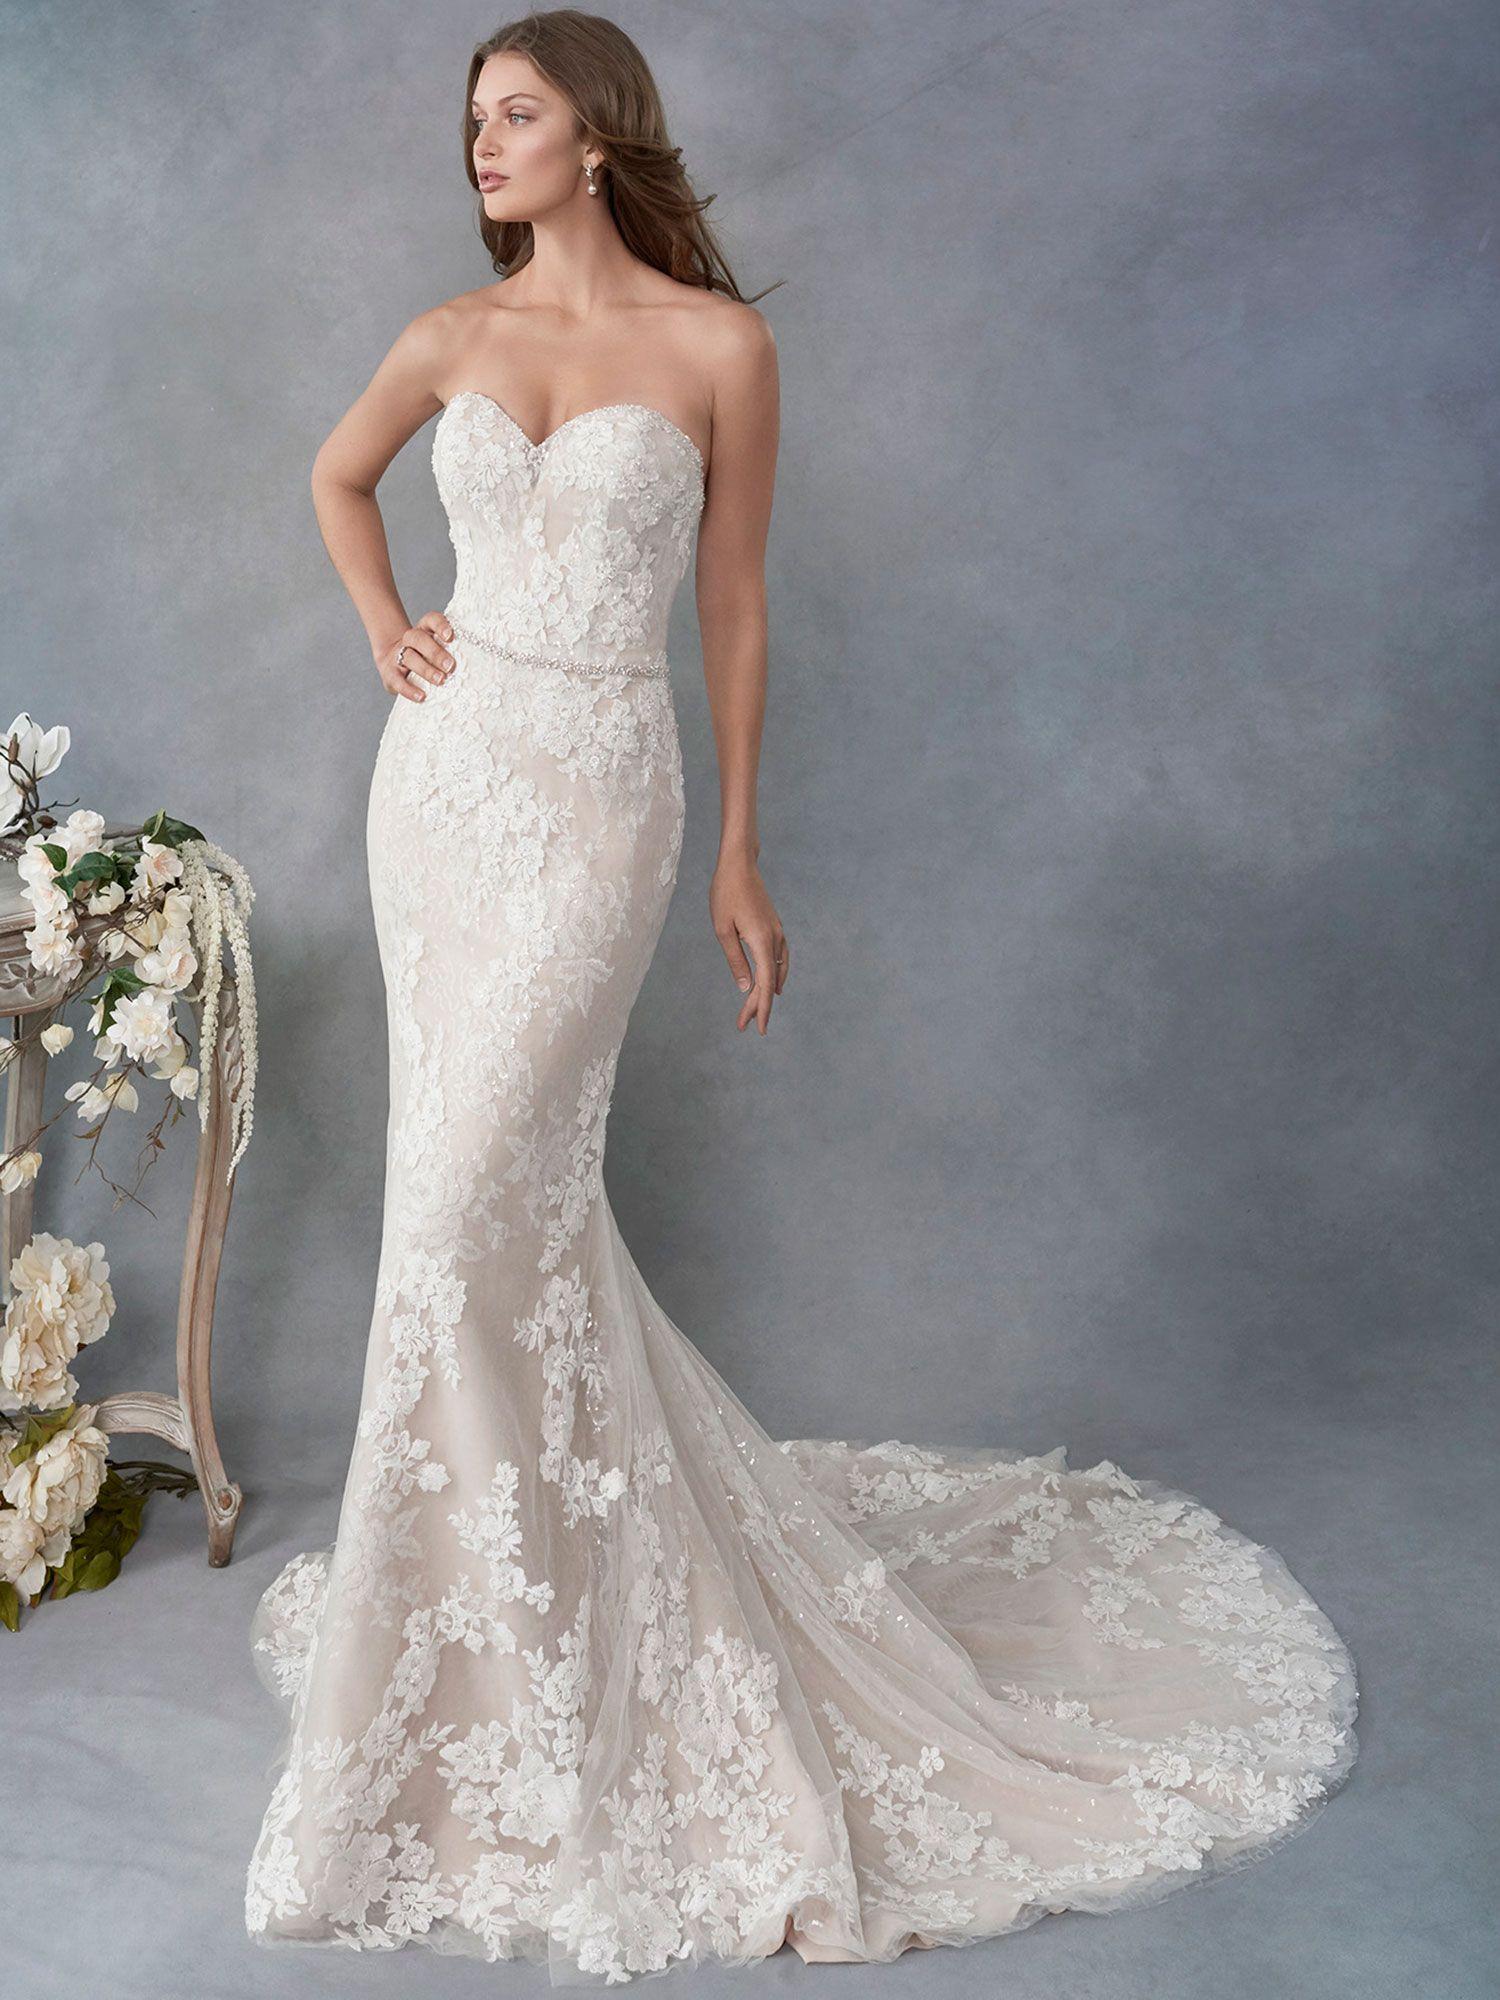 Leona Wedding Dress Morilee Wedding Dresses Lace Bridal Wedding Dresses Trumpet Style Wedding Dress [ 2630 x 1834 Pixel ]